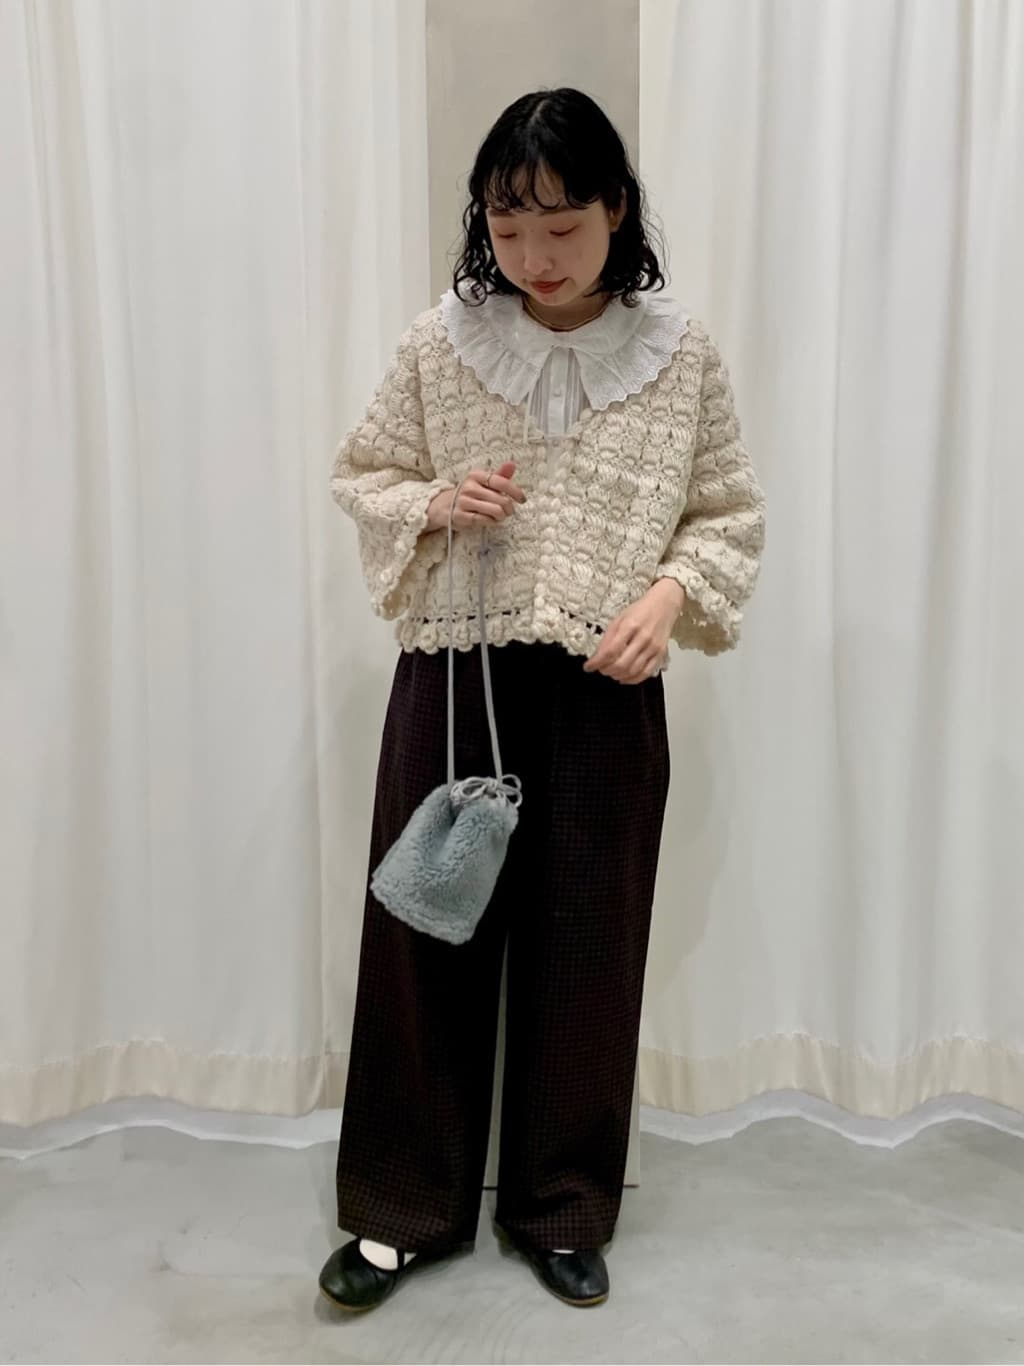 - CHILD WOMAN CHILD WOMAN , PAR ICI ルミネ横浜 身長:157cm 2021.09.14